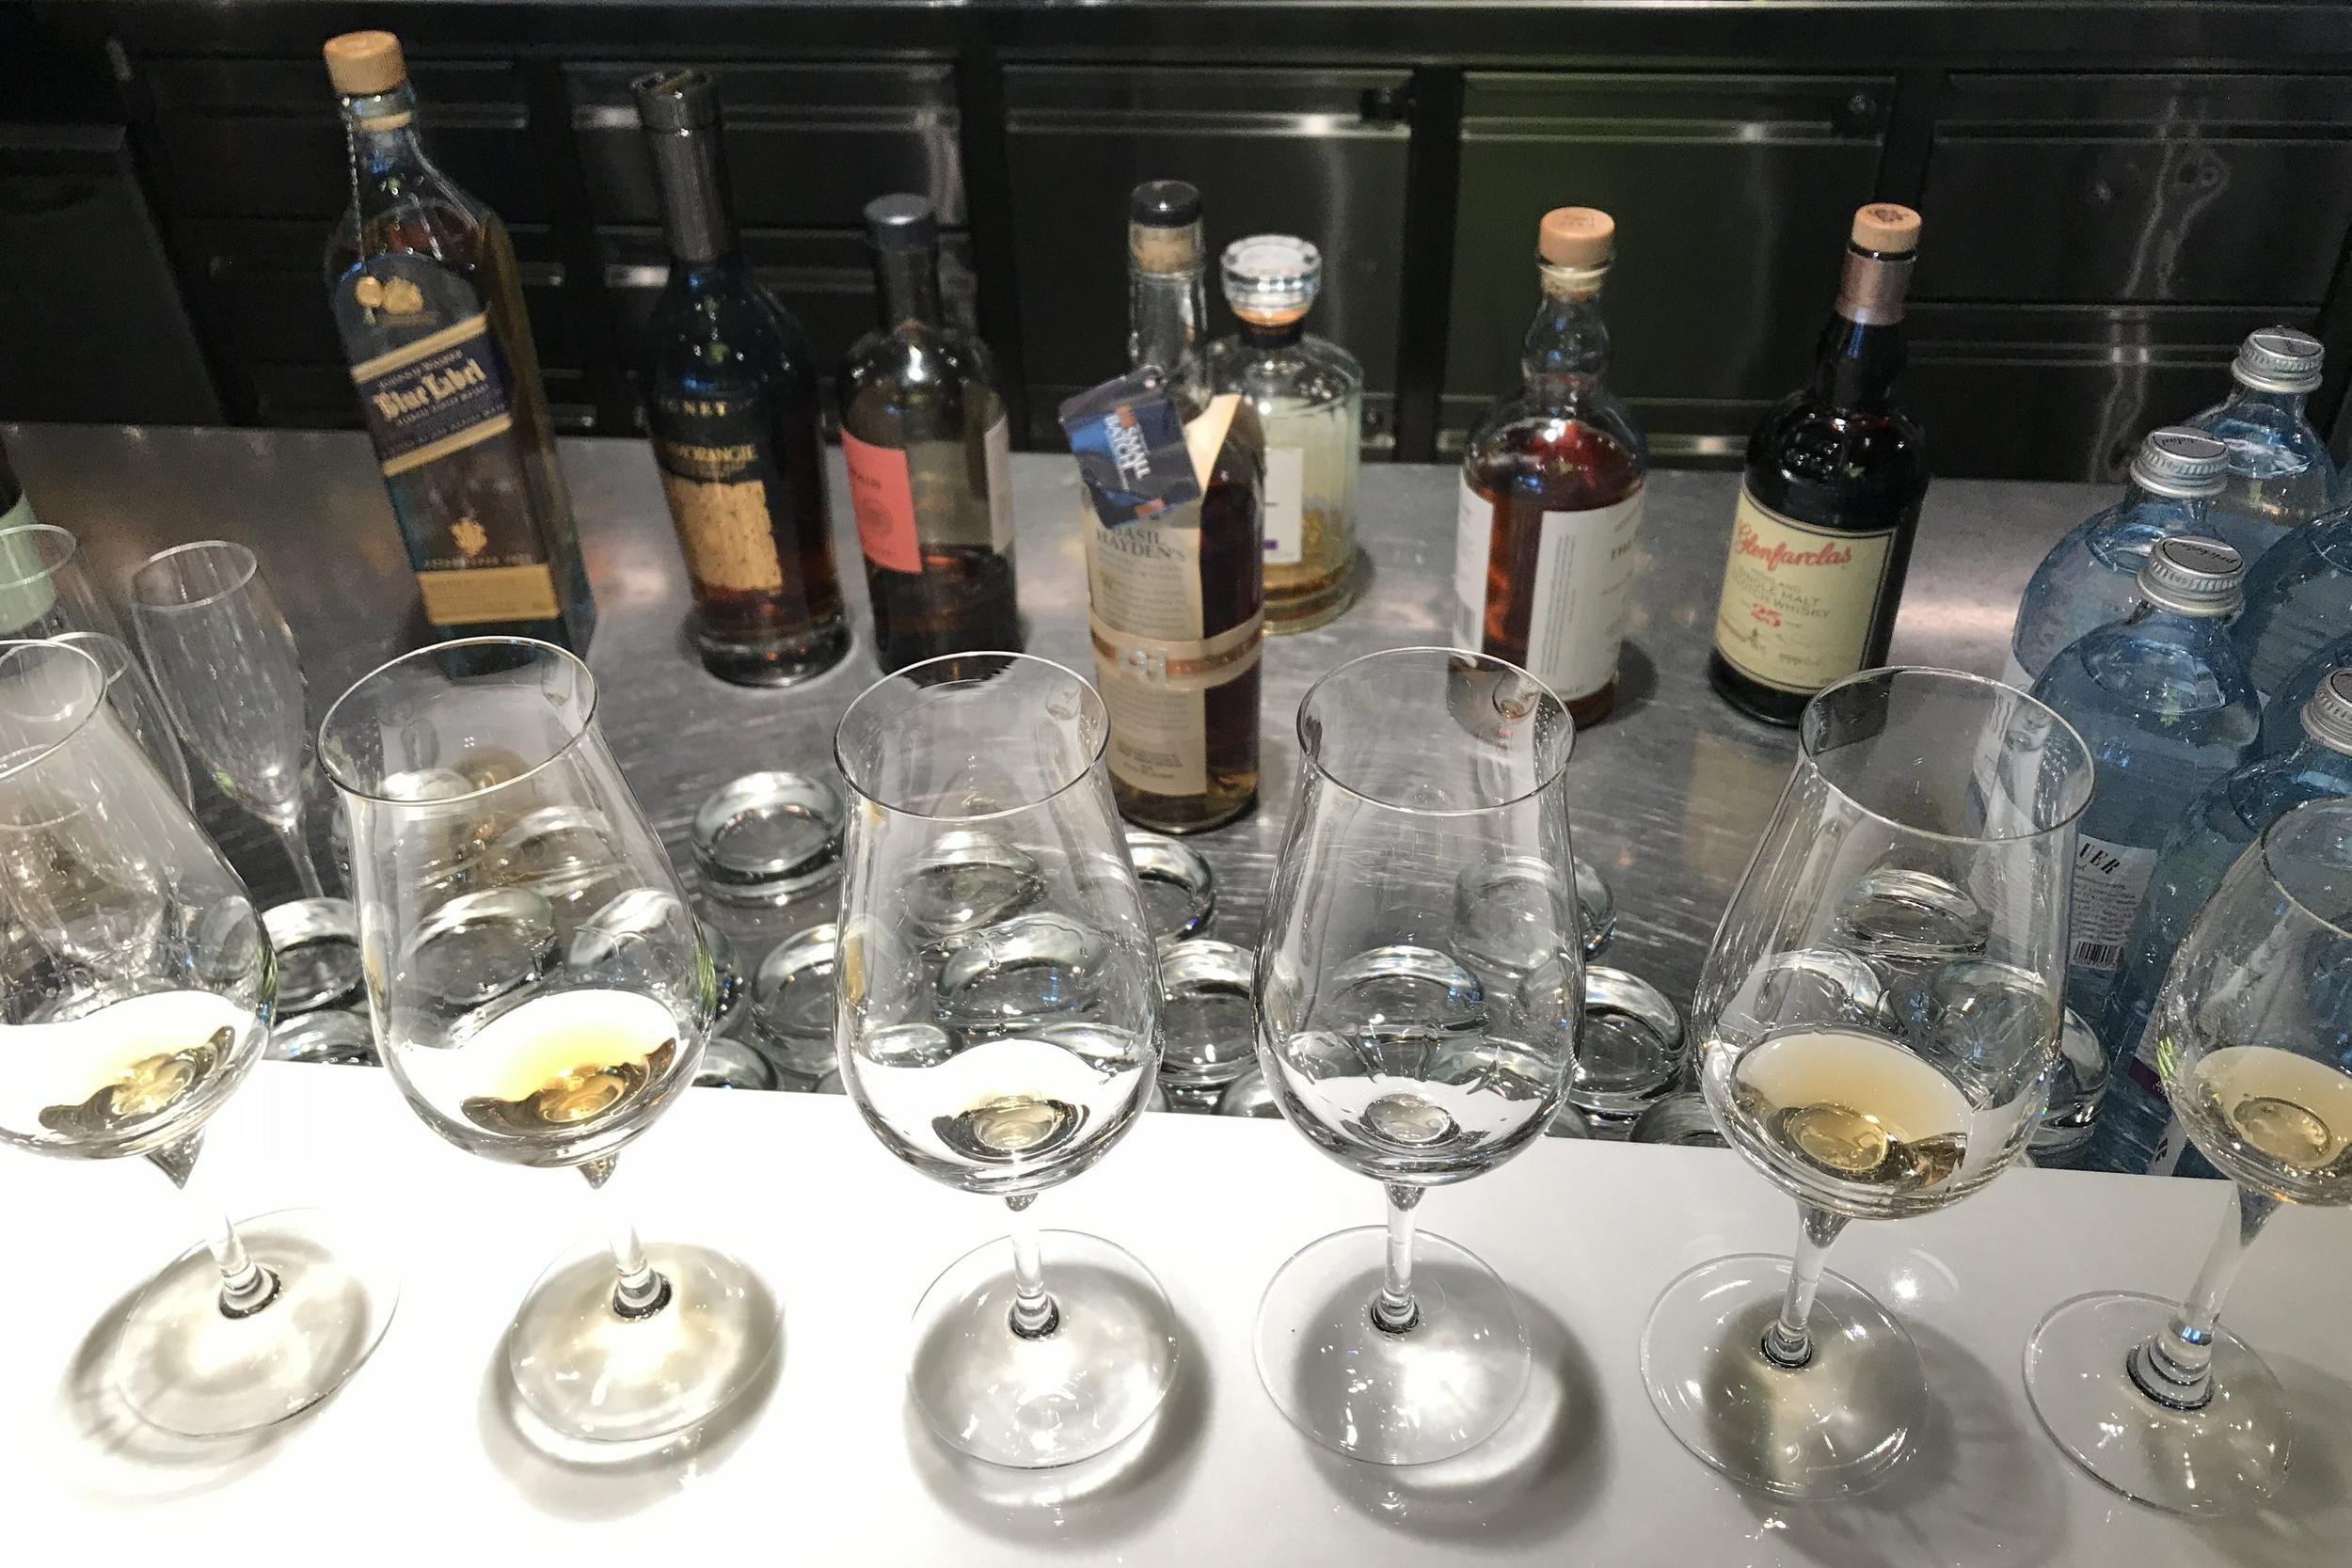 Lufthansa First Class Terminal Frankfurt – Whiskey tasting menu